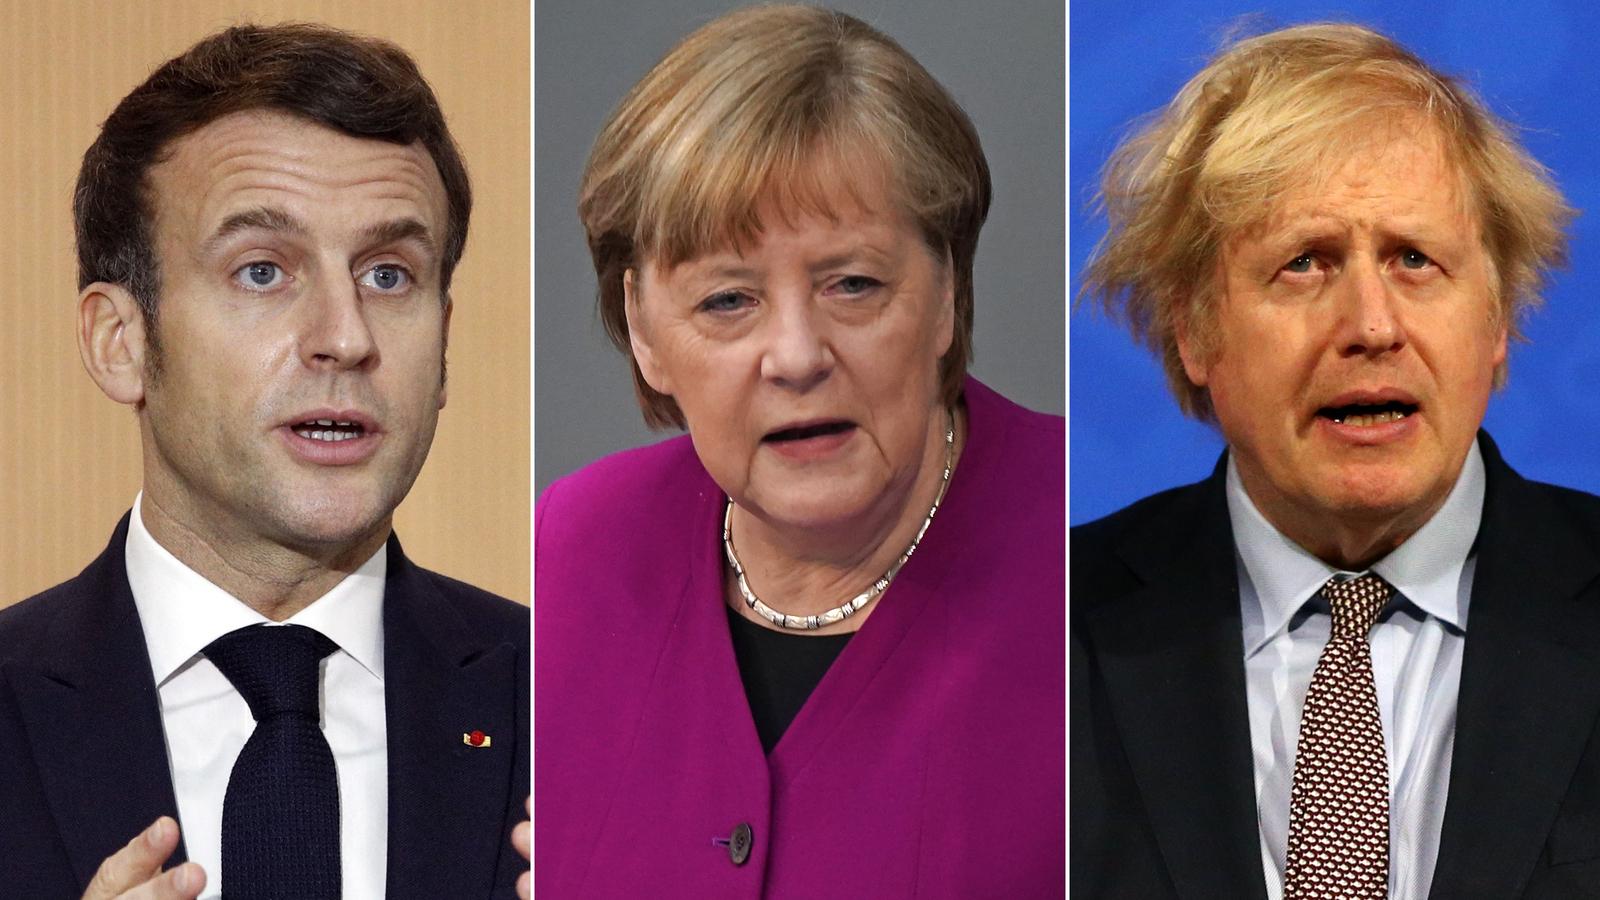 French President Emmanuel Macron, German Chancellor Angela Merkel and British Prime Minister Boris Johnson.